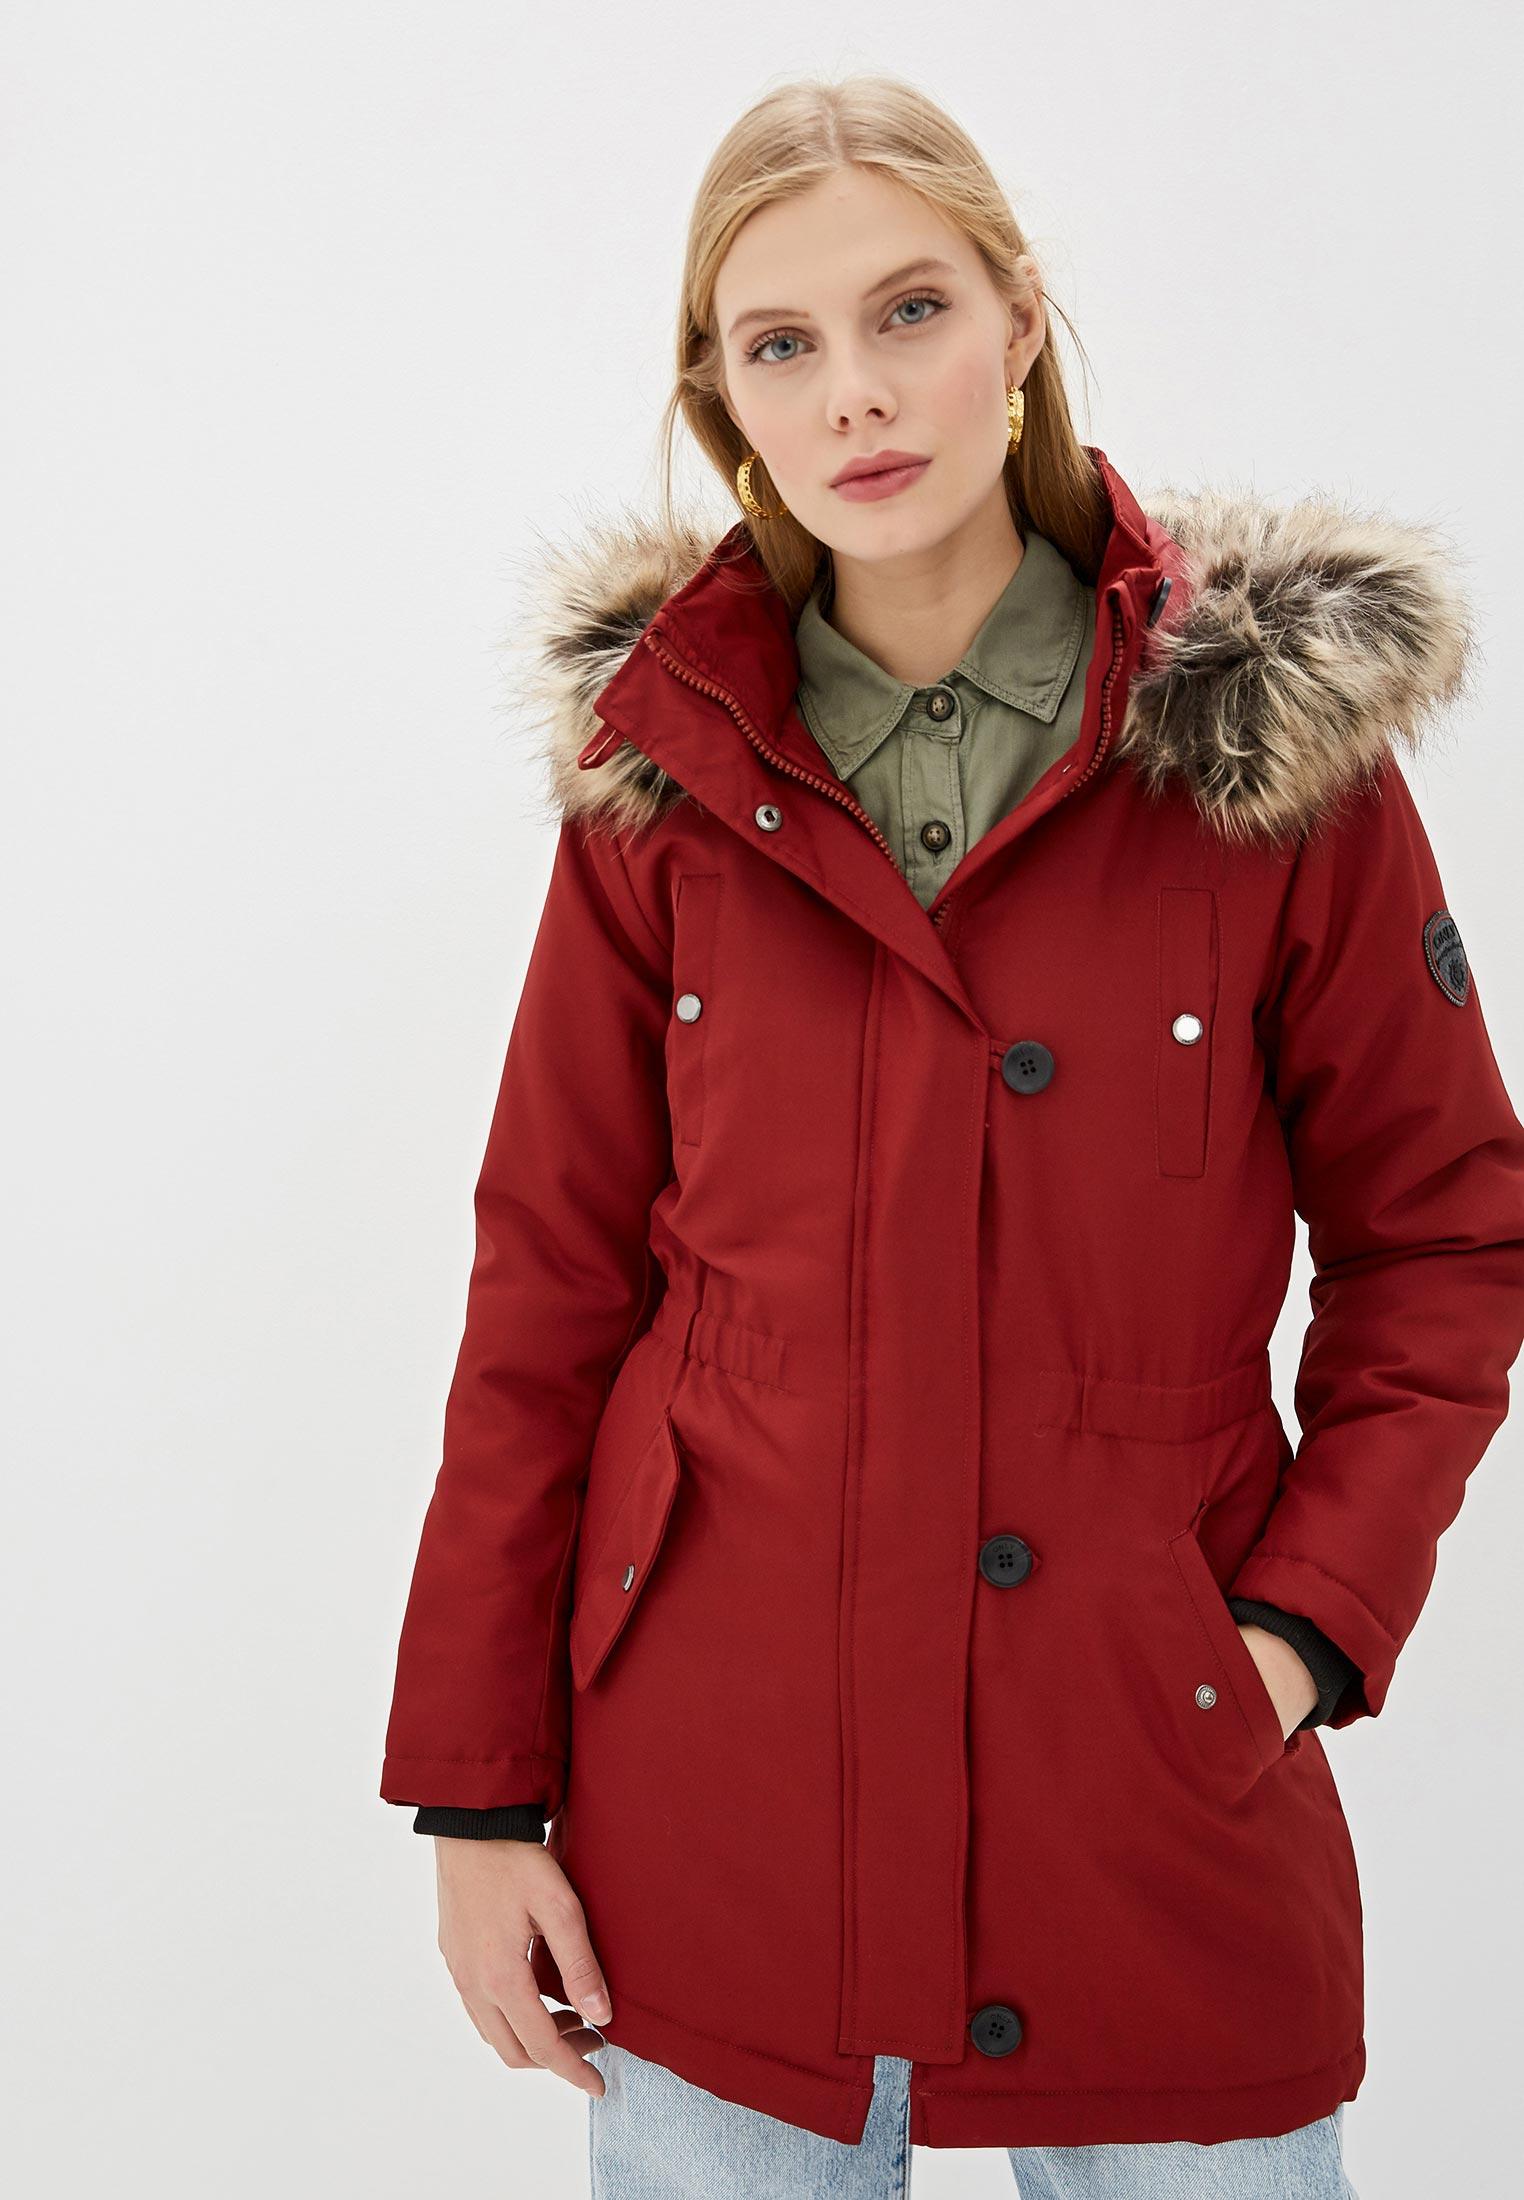 Парка, Only, цвет: бордовый. Артикул: ON380EWFPDG9. Одежда / Верхняя одежда / Парки